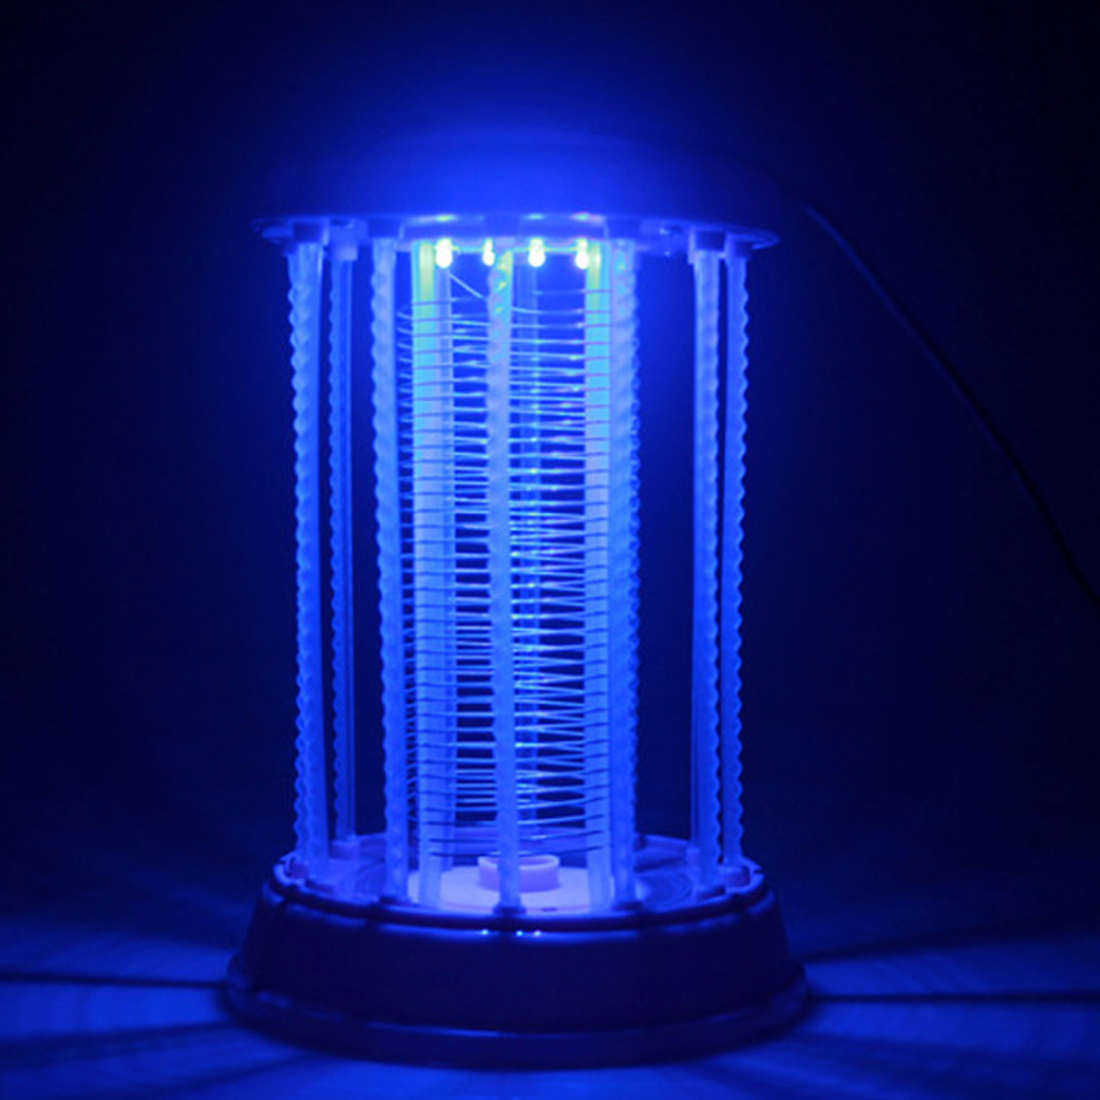 Iguardor Household Restaurant Electronic Shock Mosquito Killer Lamp LED Light Mute Anti-radiation Outdoor Garden Insect Killer